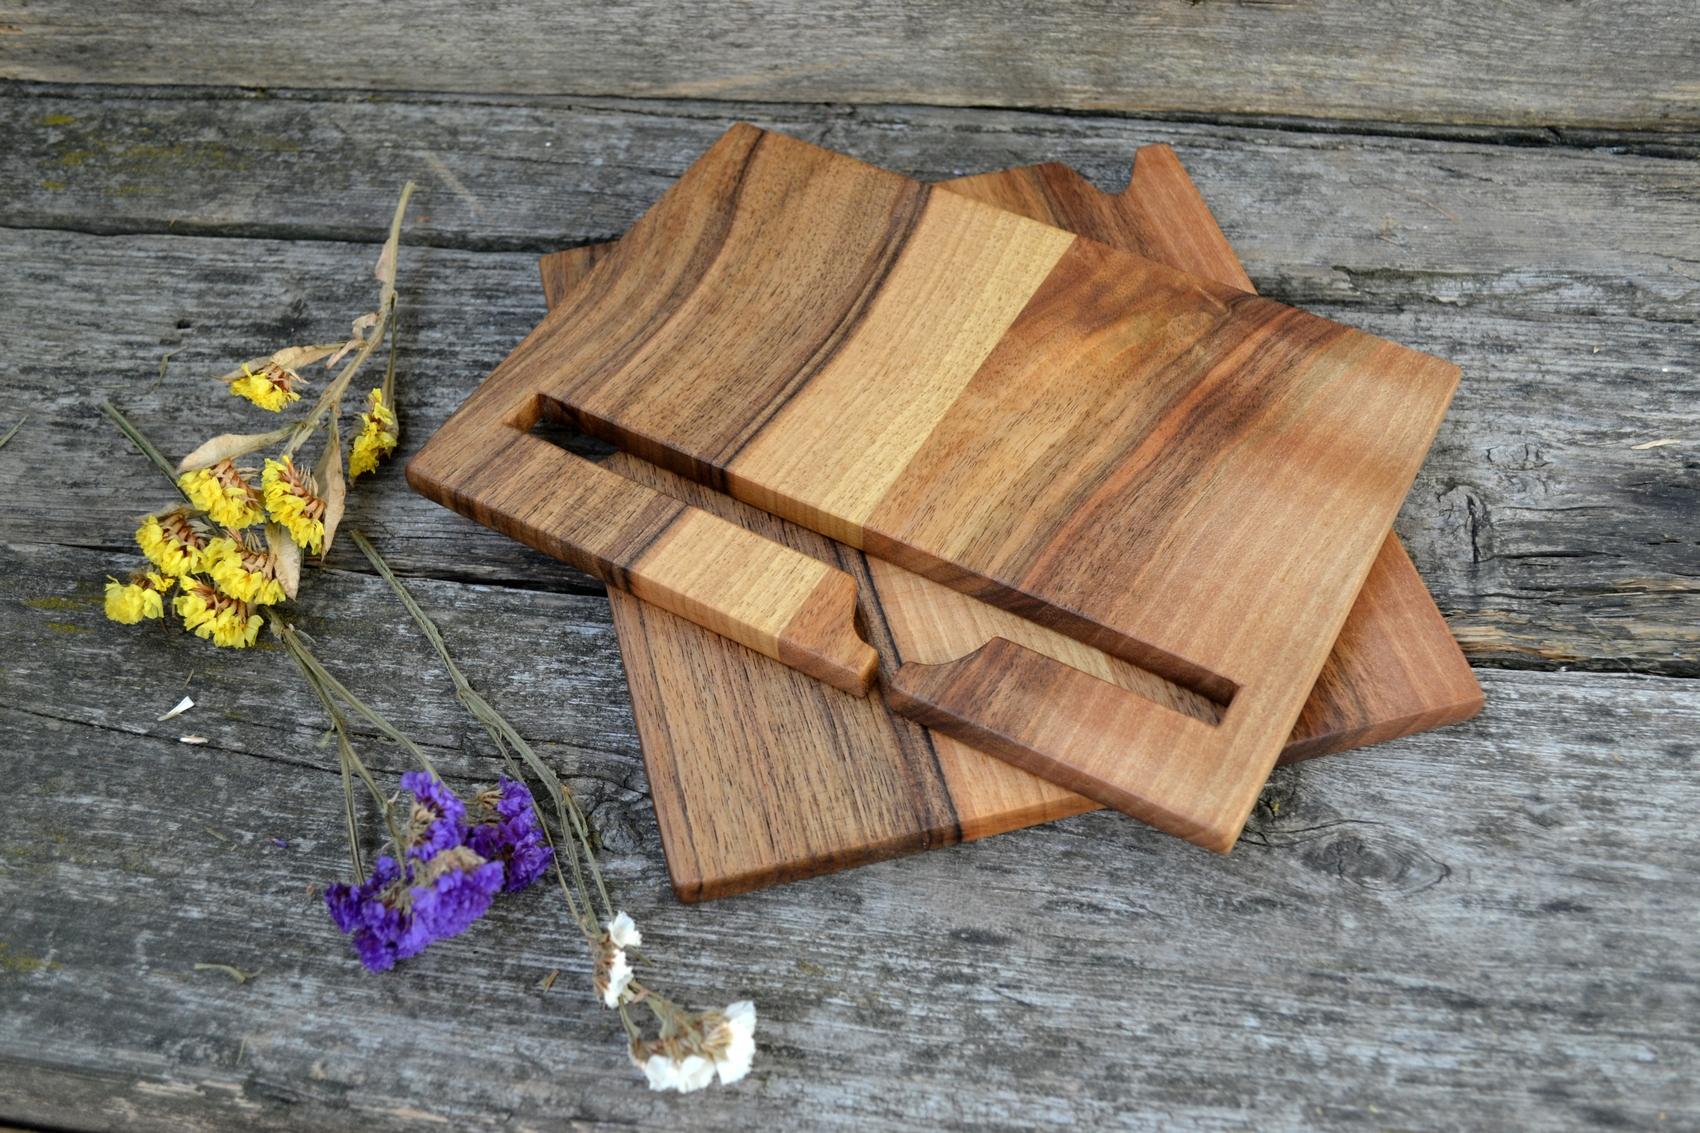 Buy Wood Phone Docking Station, Walnut Desk Organizer